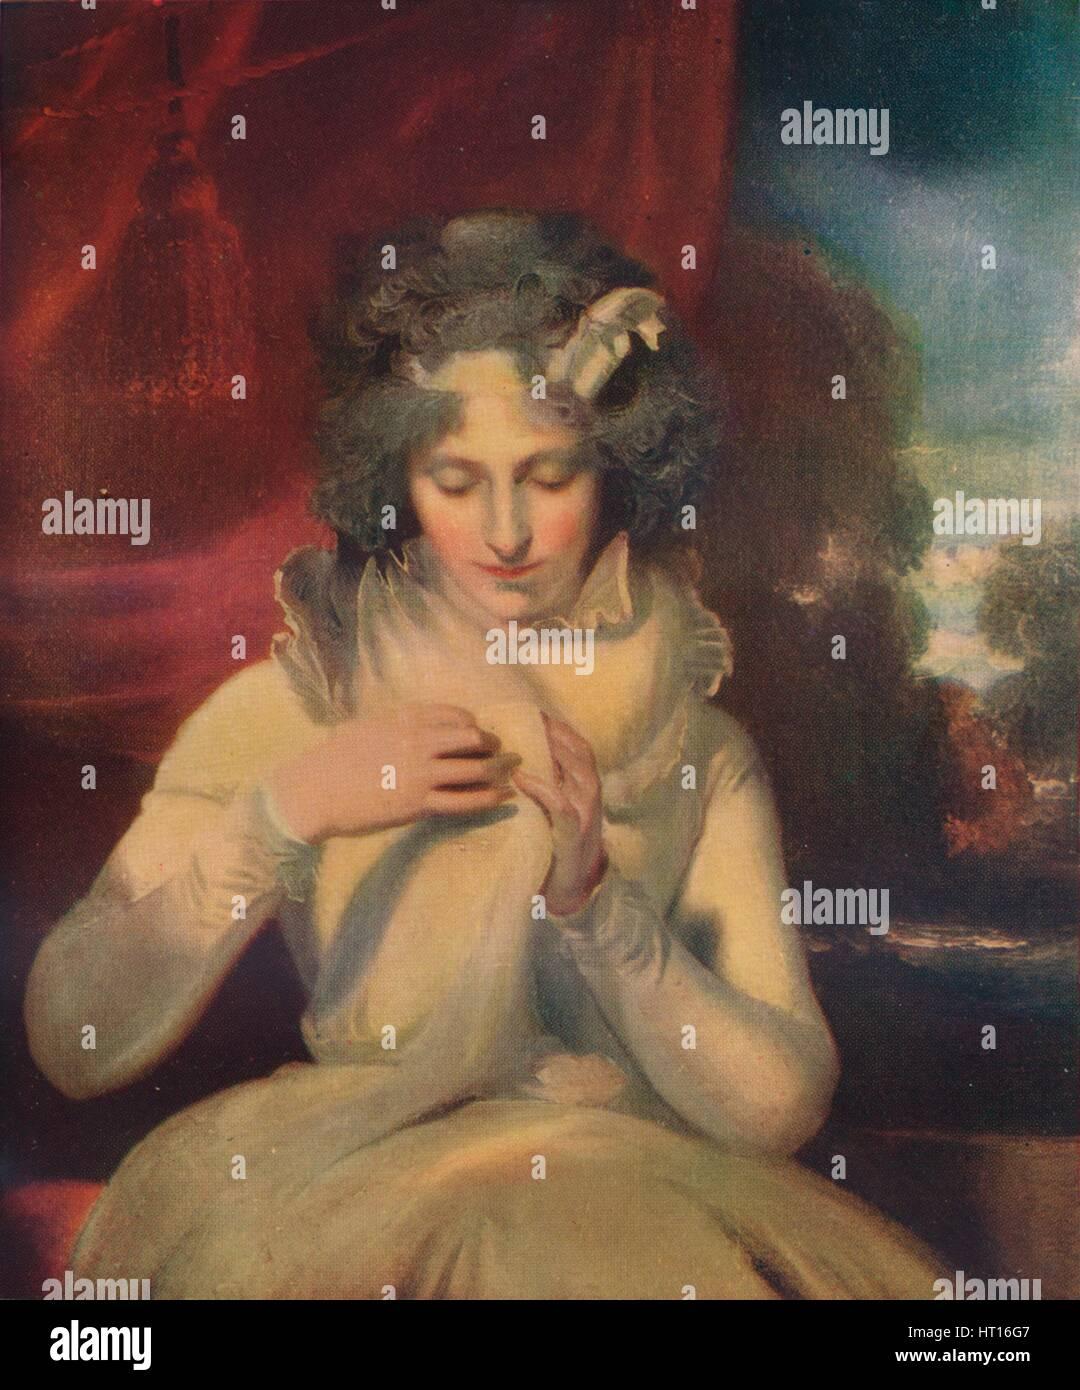 'Miss Georgina Lennox, afterwards Countess Bathurst', (1765-1842)', c1800. Artist: Thomas Lawrence. - Stock Image